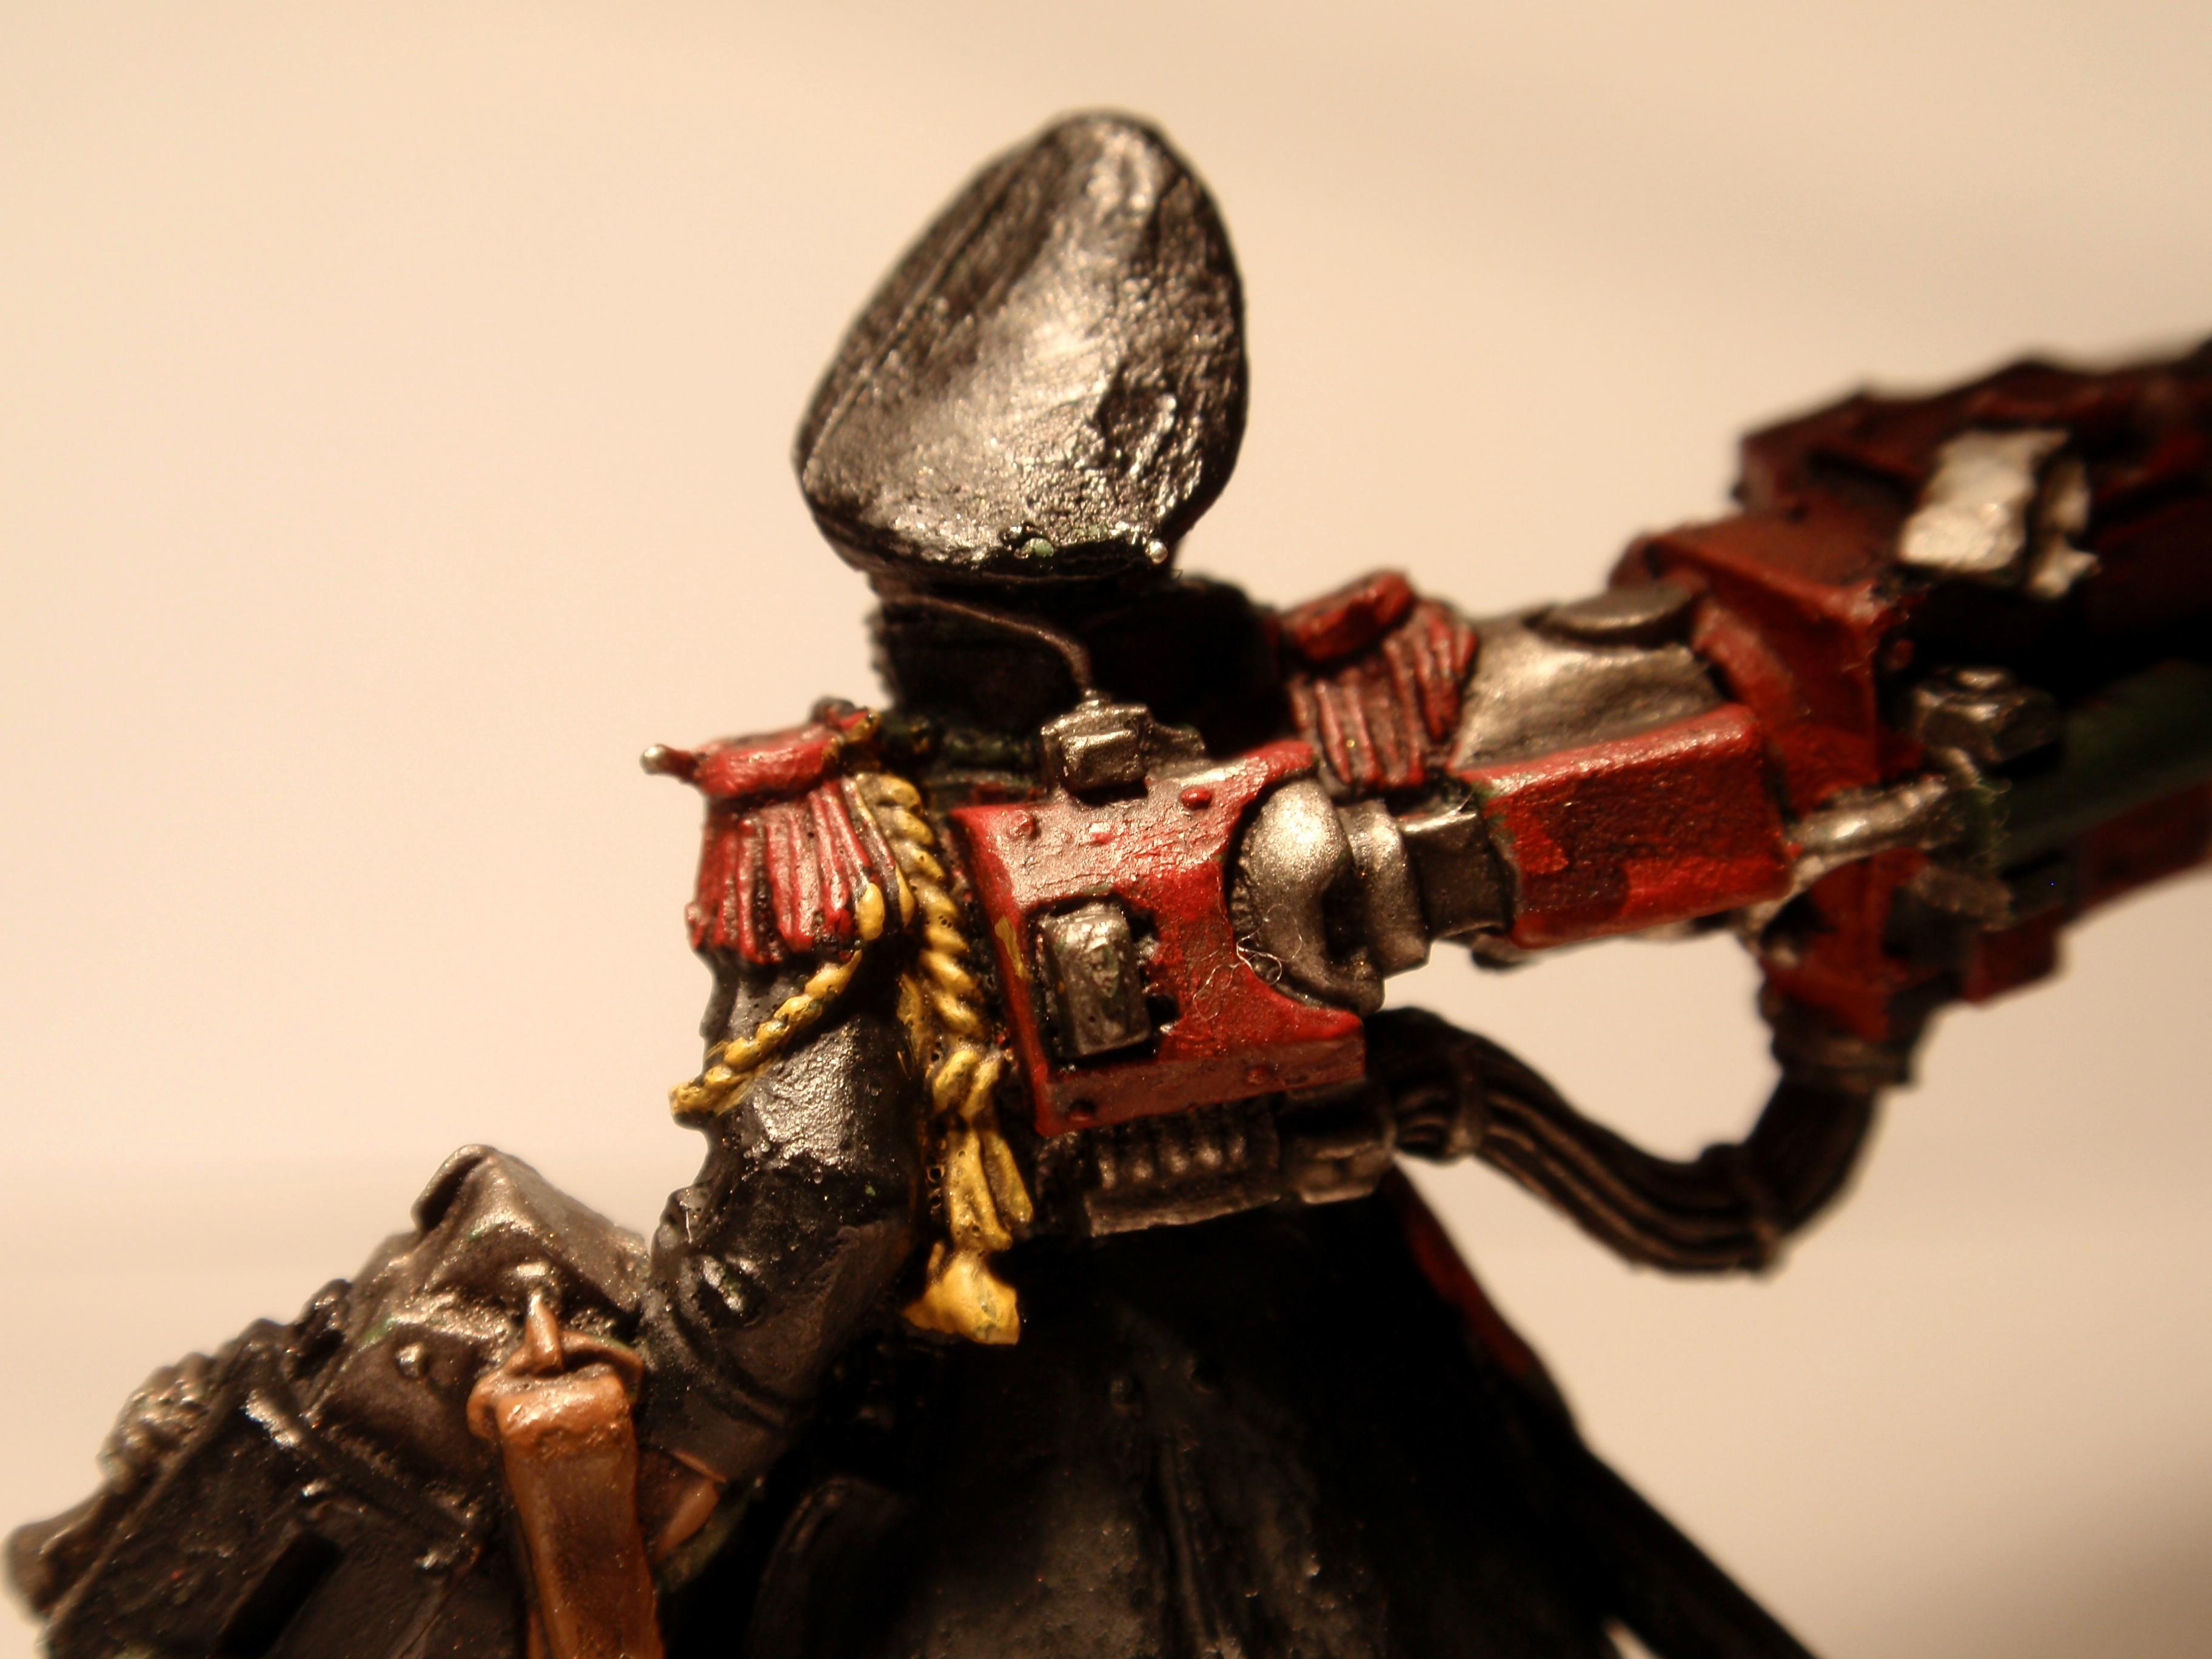 Commissar, Imperial Guard, Yarrick